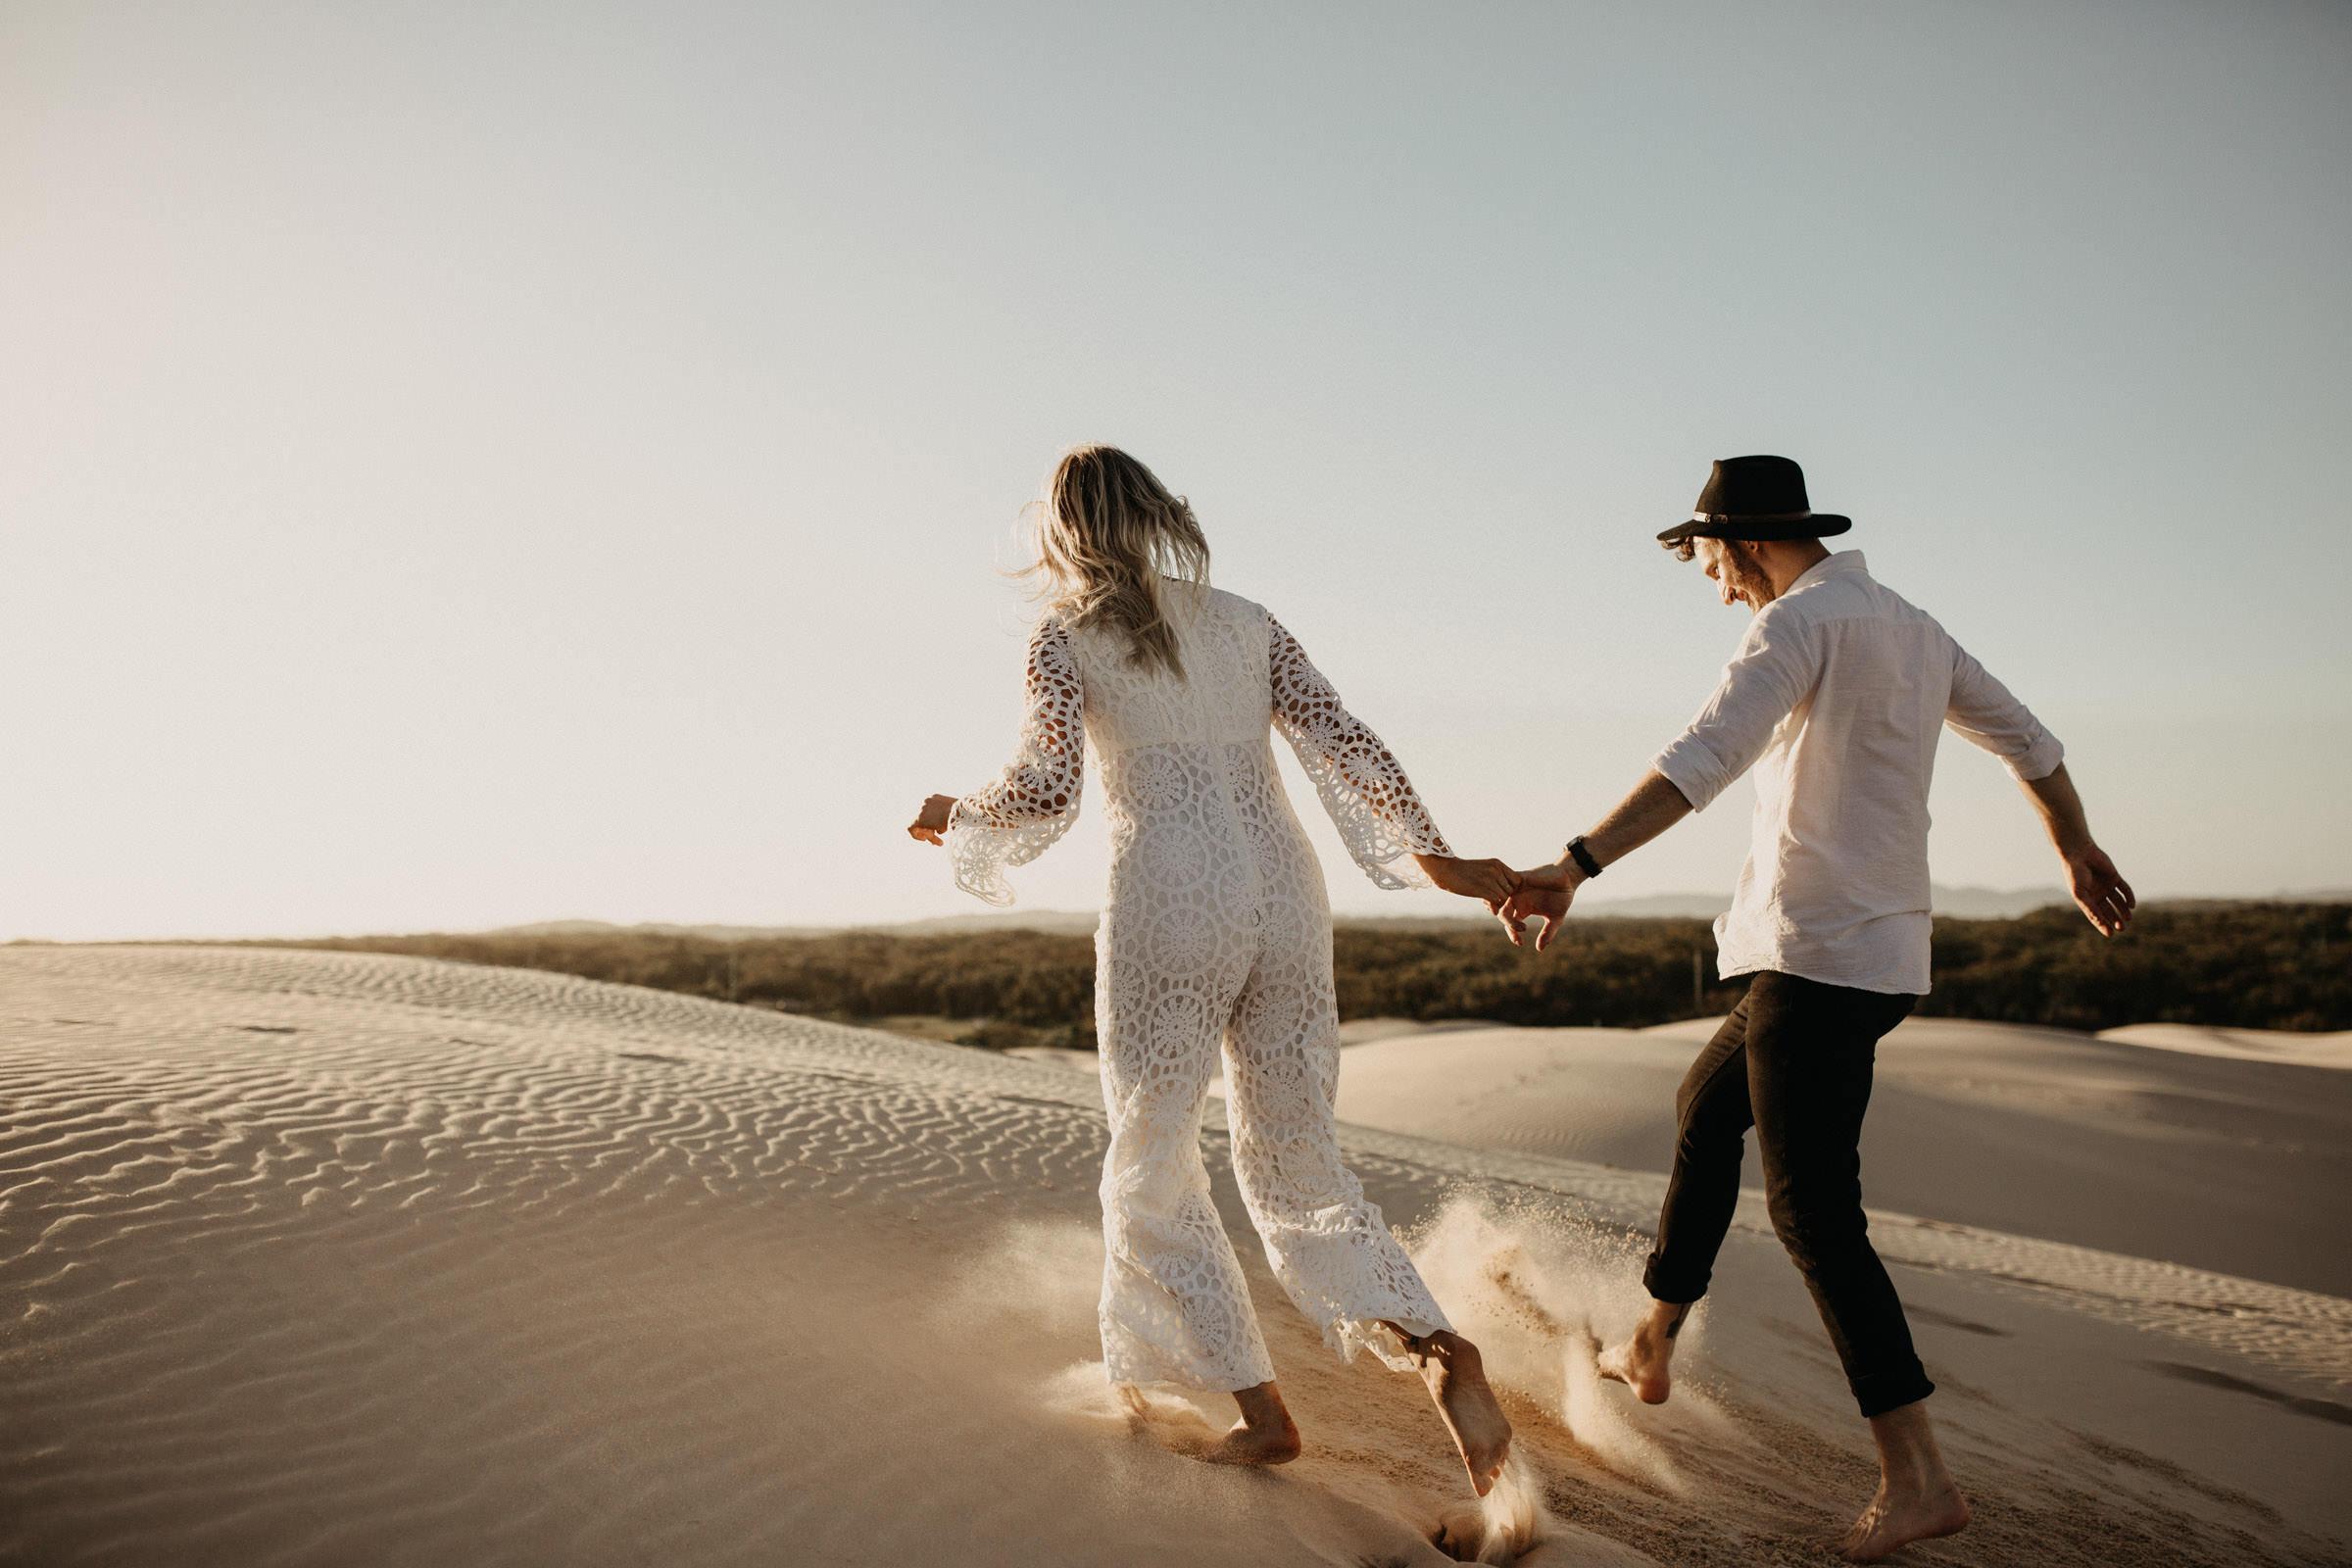 Stockon-sand-dunes-shoot-18.jpg